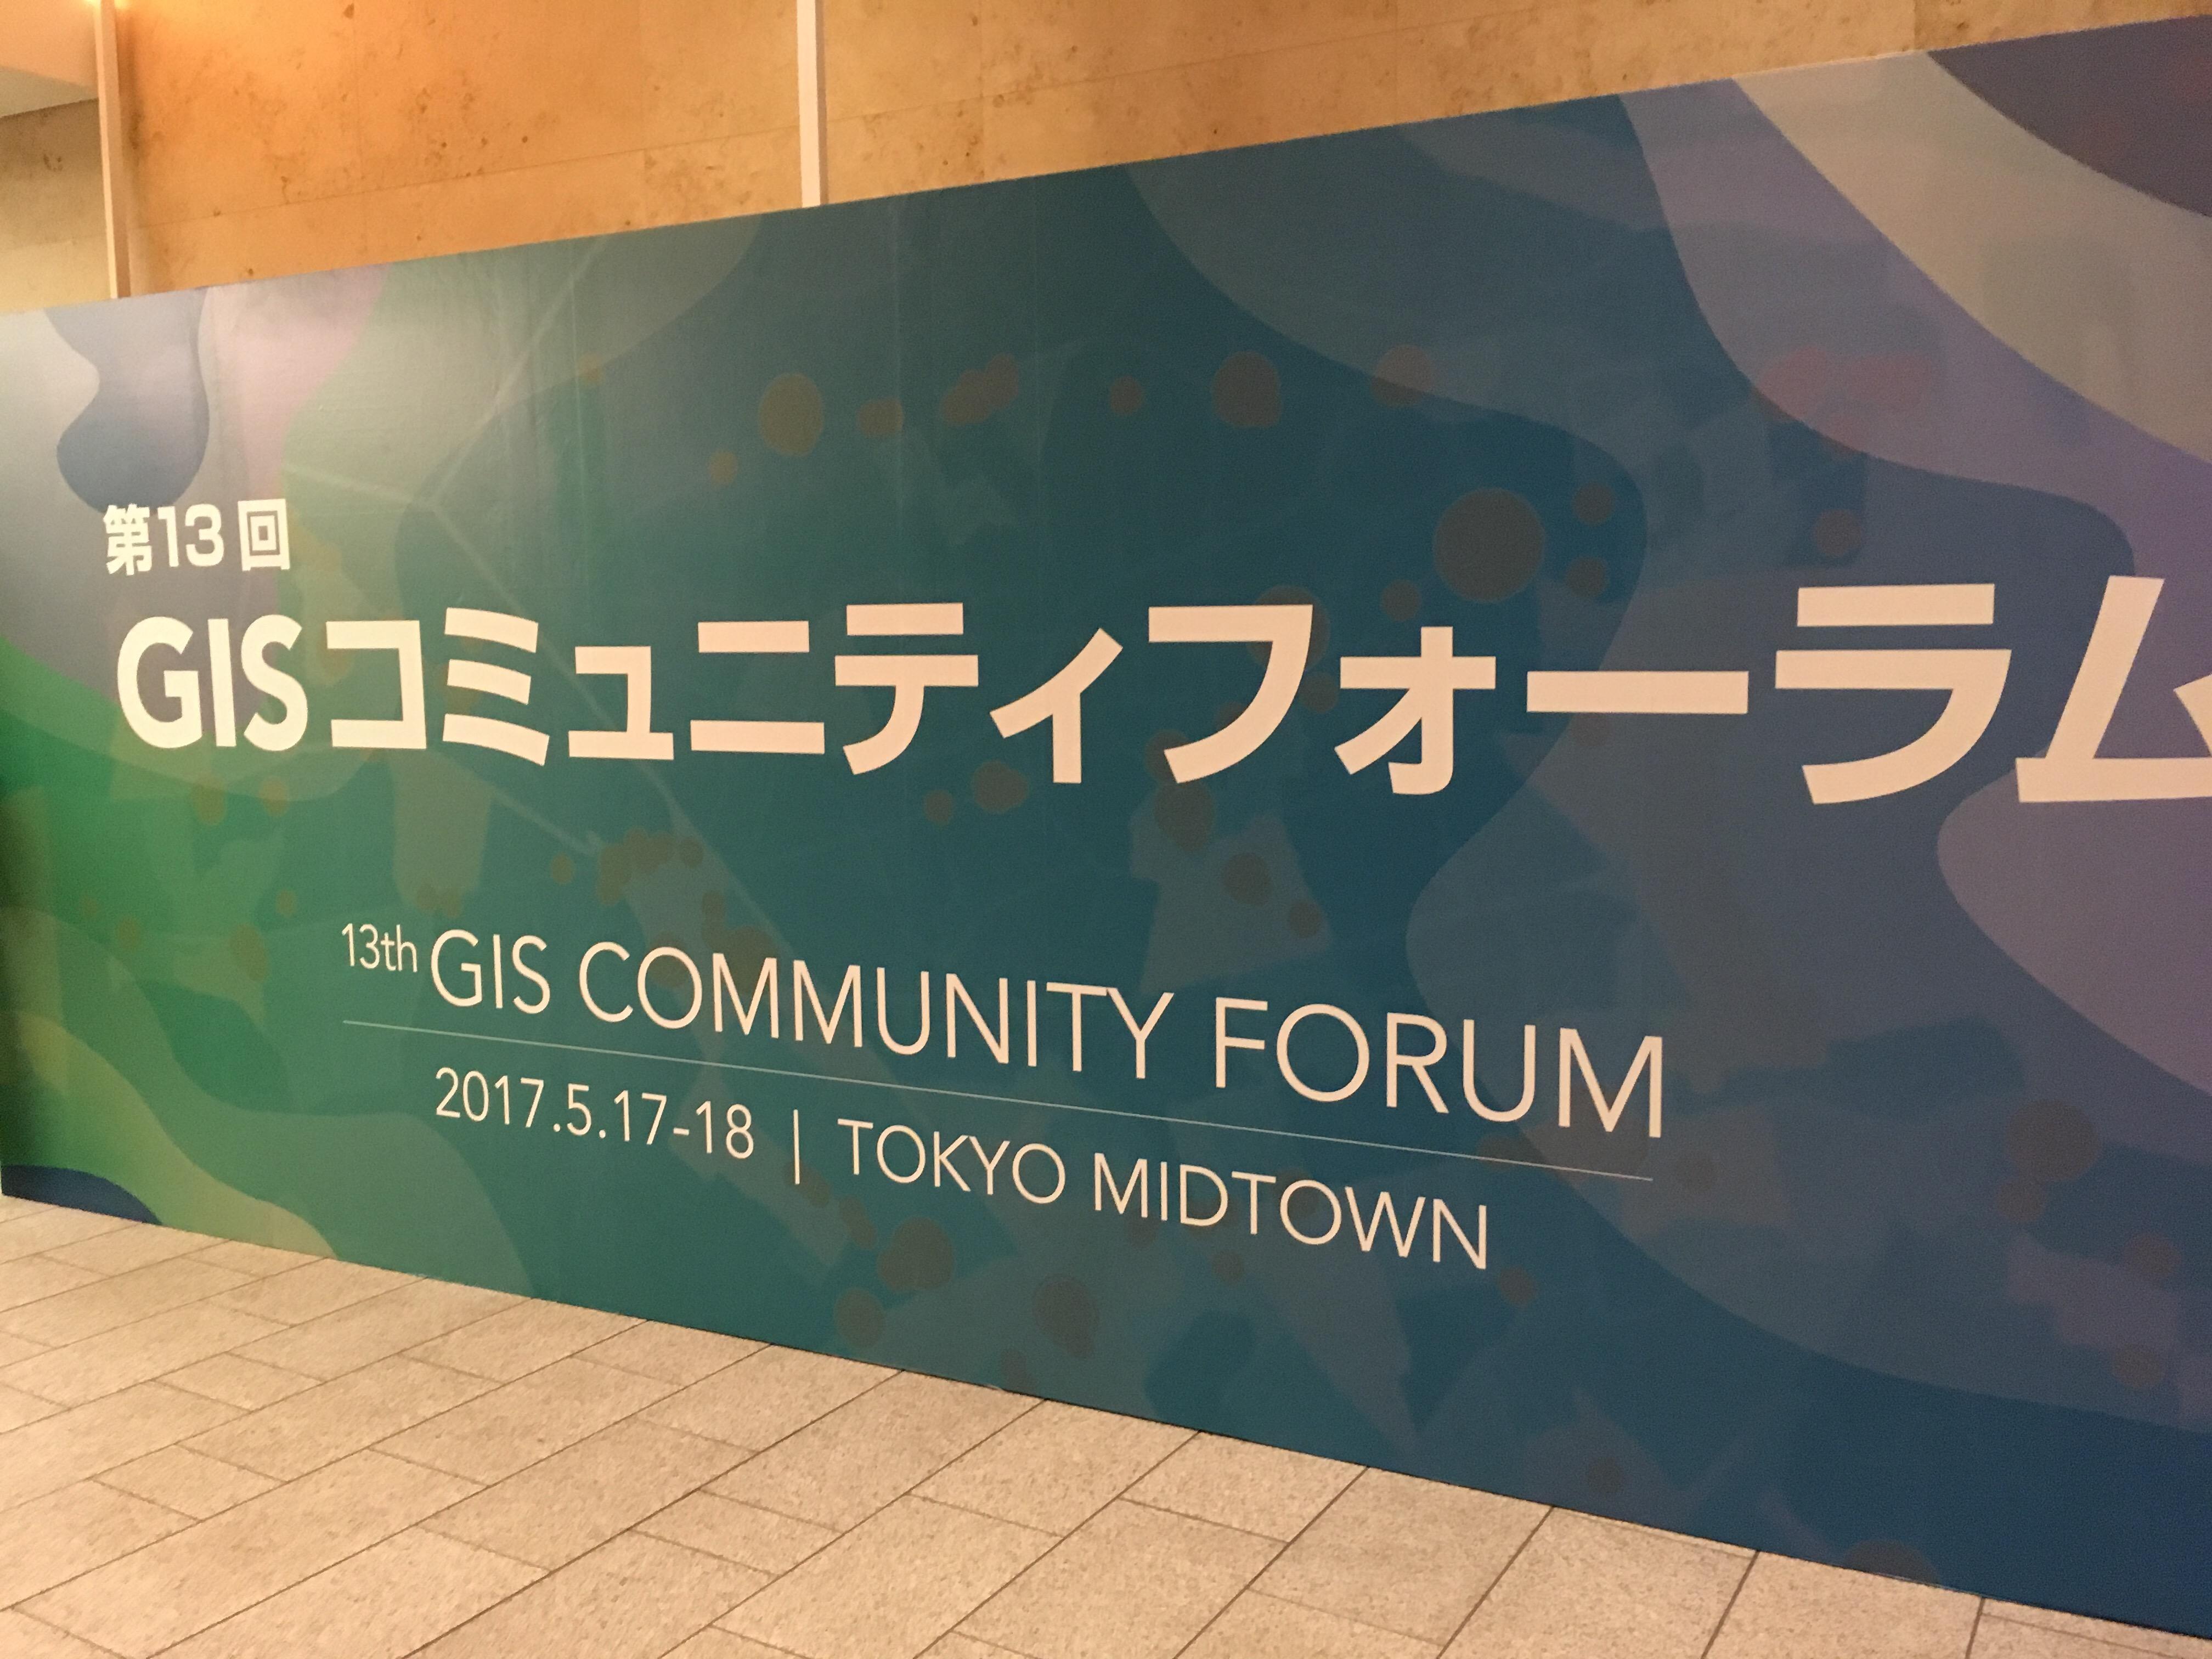 img 1261 - 東京ミッドタウン